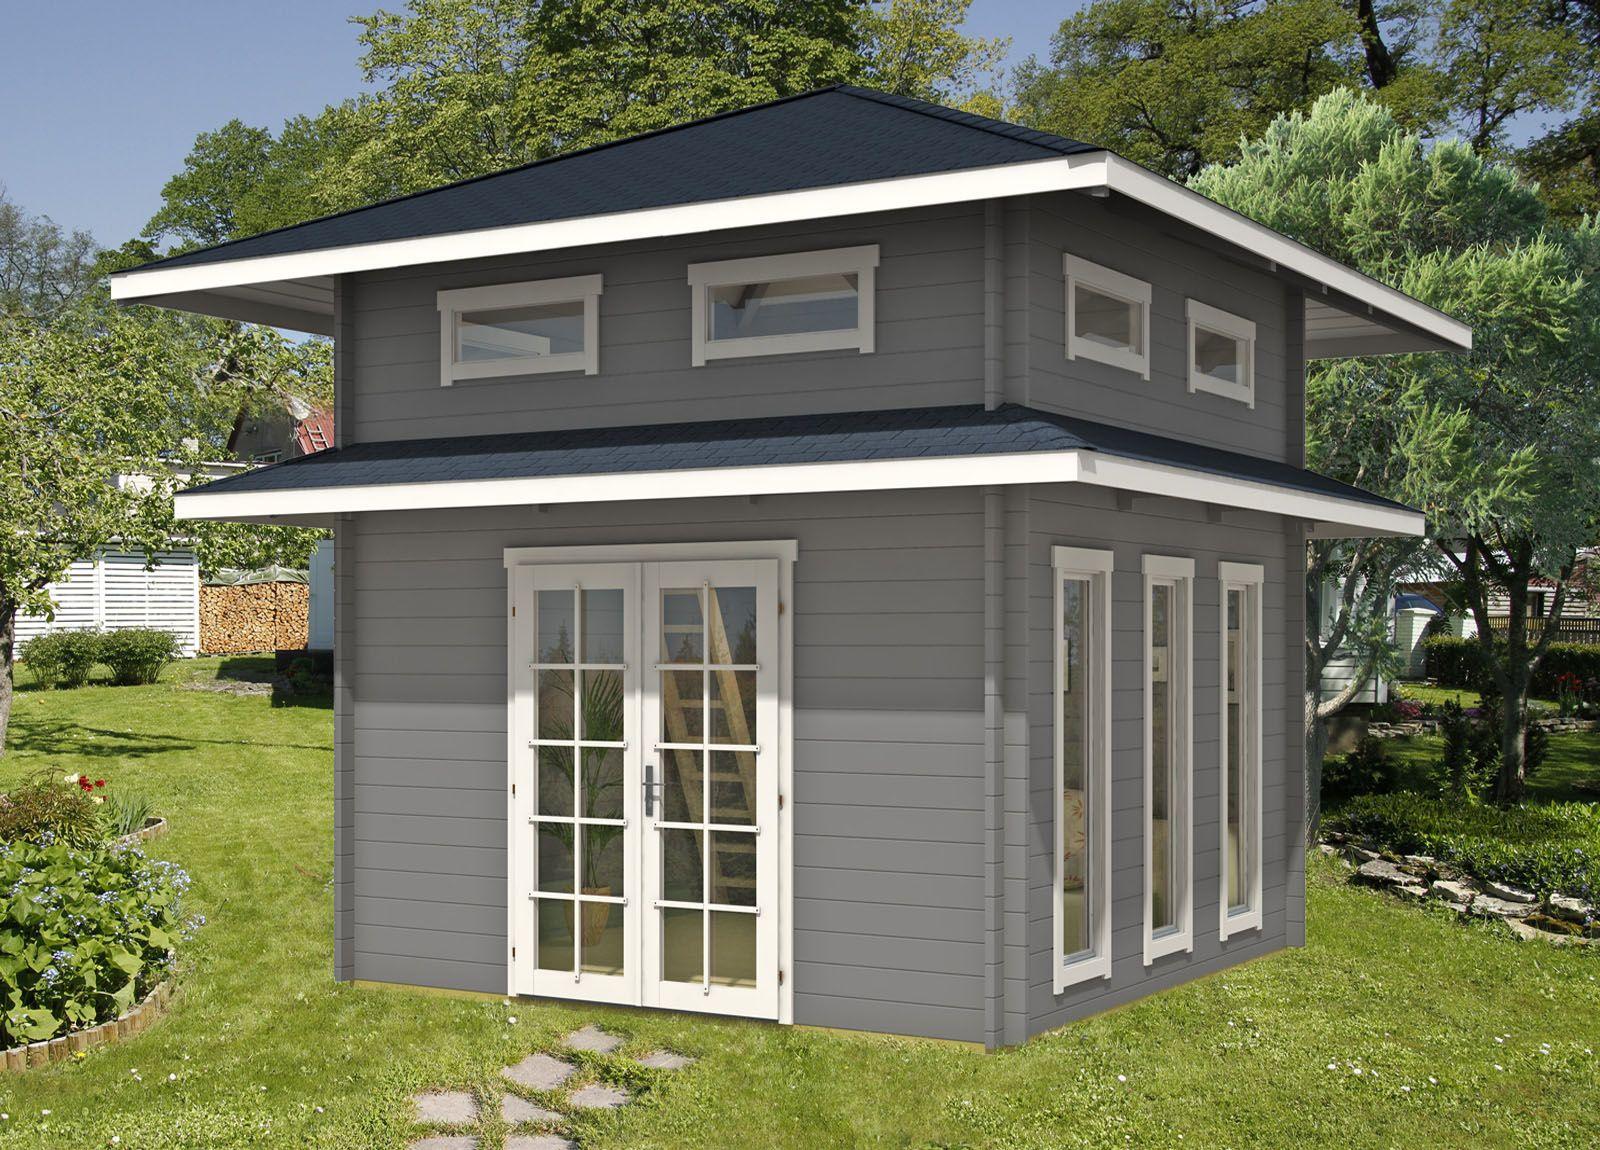 Gartenhaus Nebraska Best tiny house, Modern tiny house